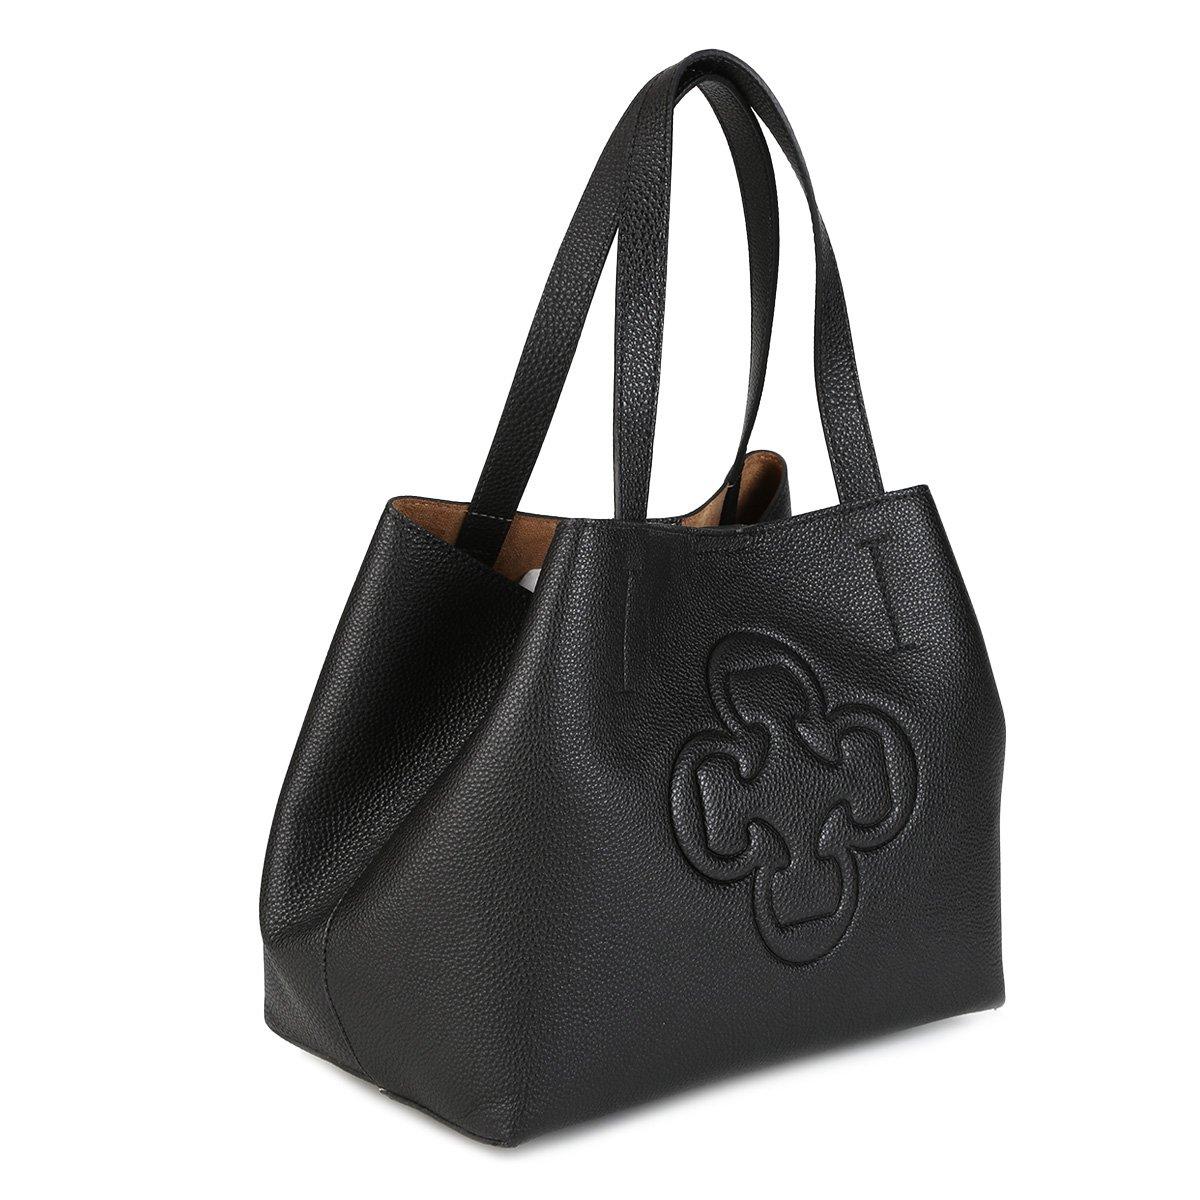 Bolsa Preto Capodarte Handbag Bolsa Capodarte Relax Relax Soft Feminina Soft Capodarte Preto Handbag Bolsa Feminina 8CqwT46q